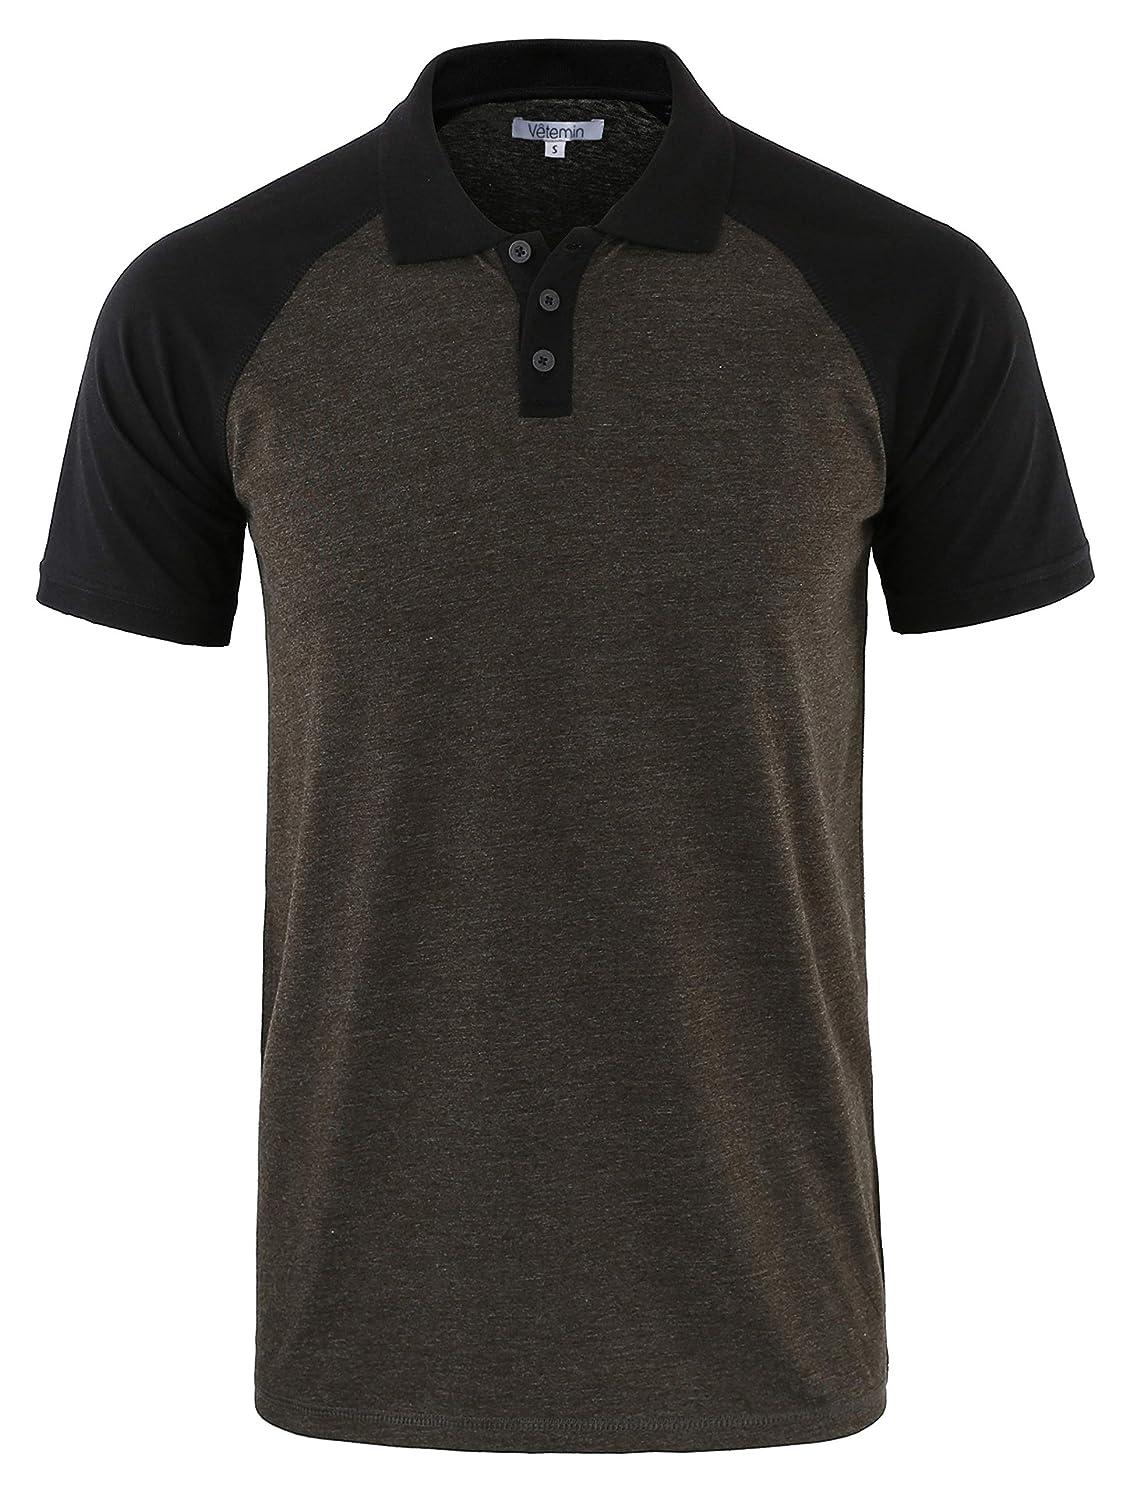 Vetemin Mens Casual Retro Short Sleeve Active Raglan Jersey Polo Henley T Shirt